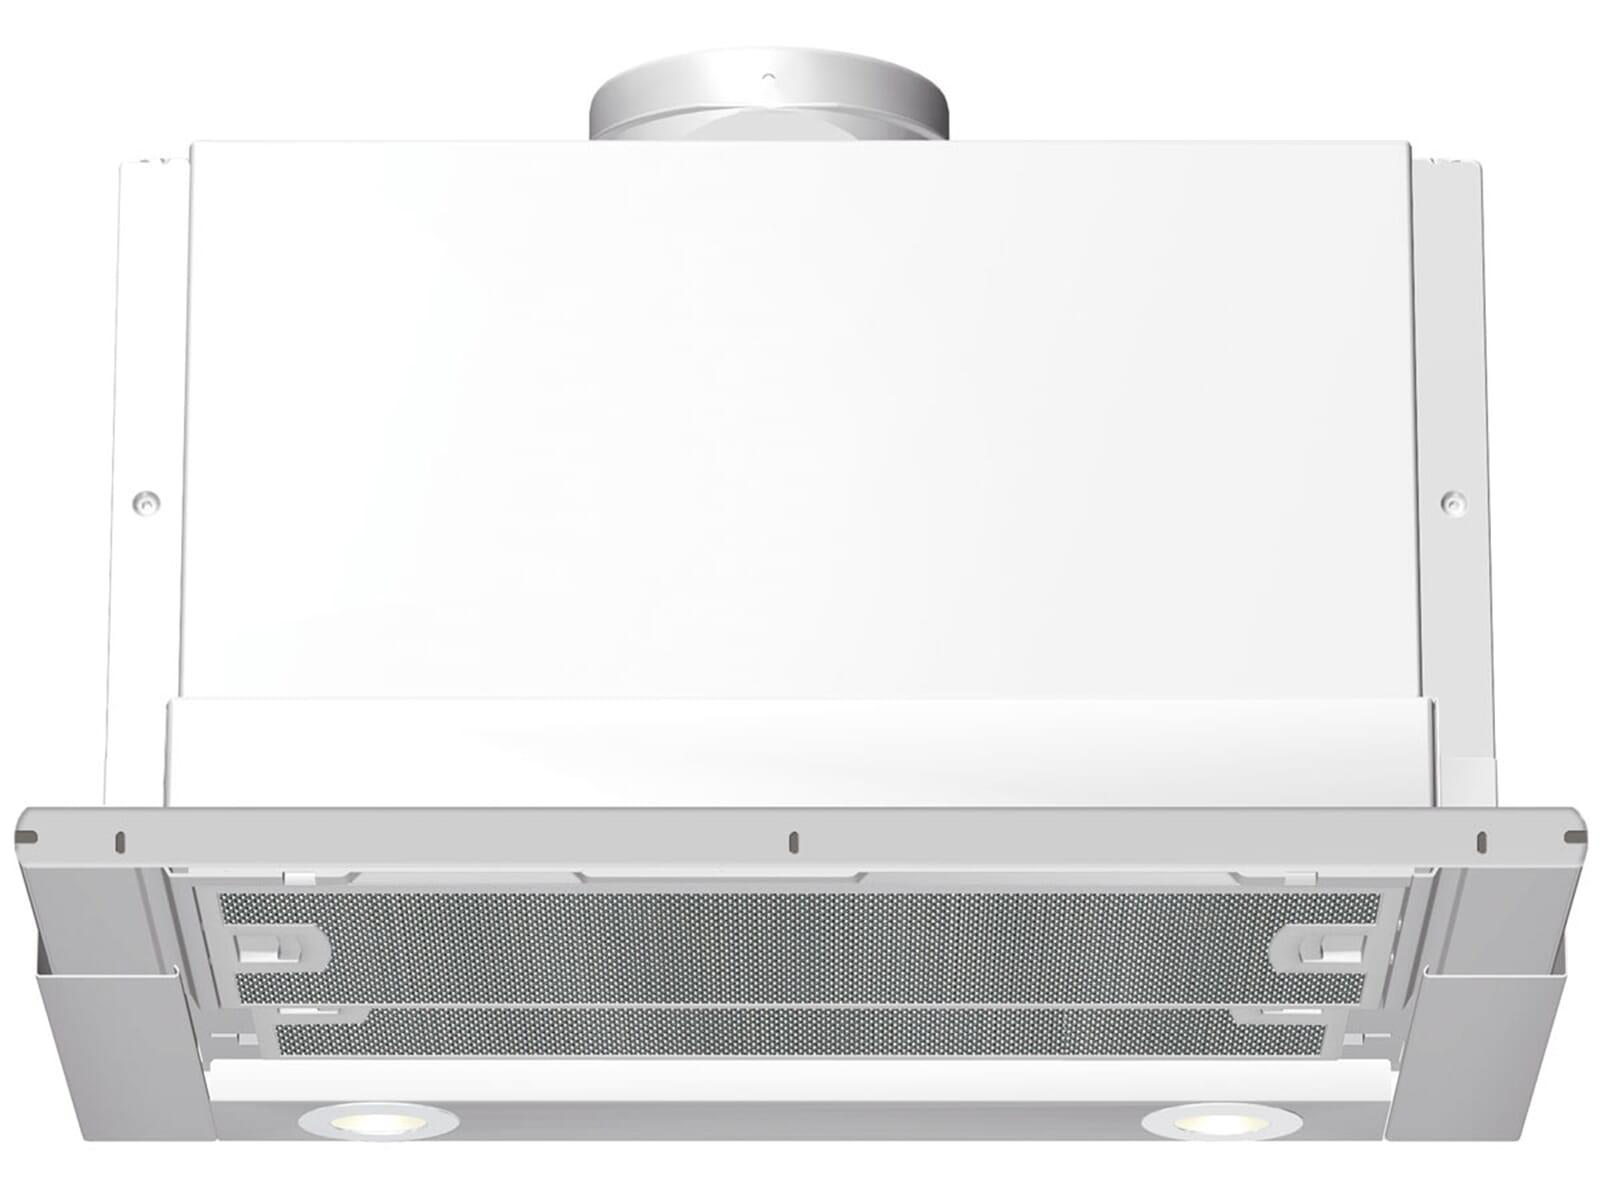 neff da 76 b flachschirm dunstabzugshaube silbermetallic f r 274 90 eur. Black Bedroom Furniture Sets. Home Design Ideas